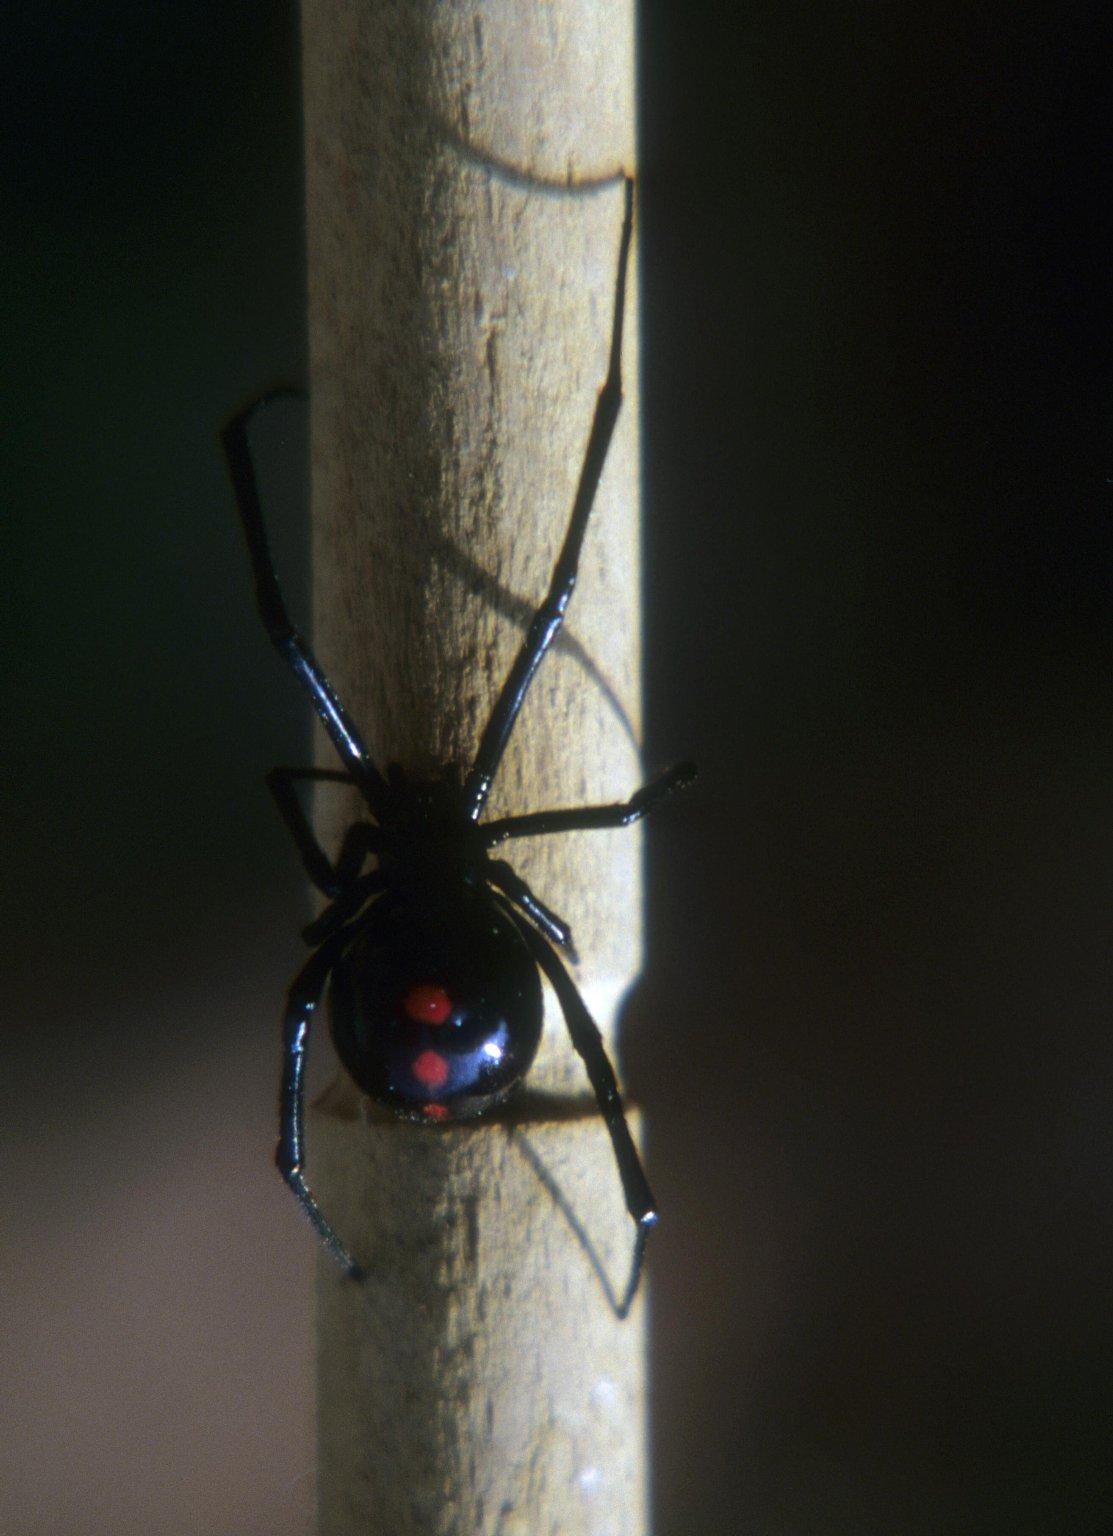 Black widow spider Latrodectus sp (Theridiidae)